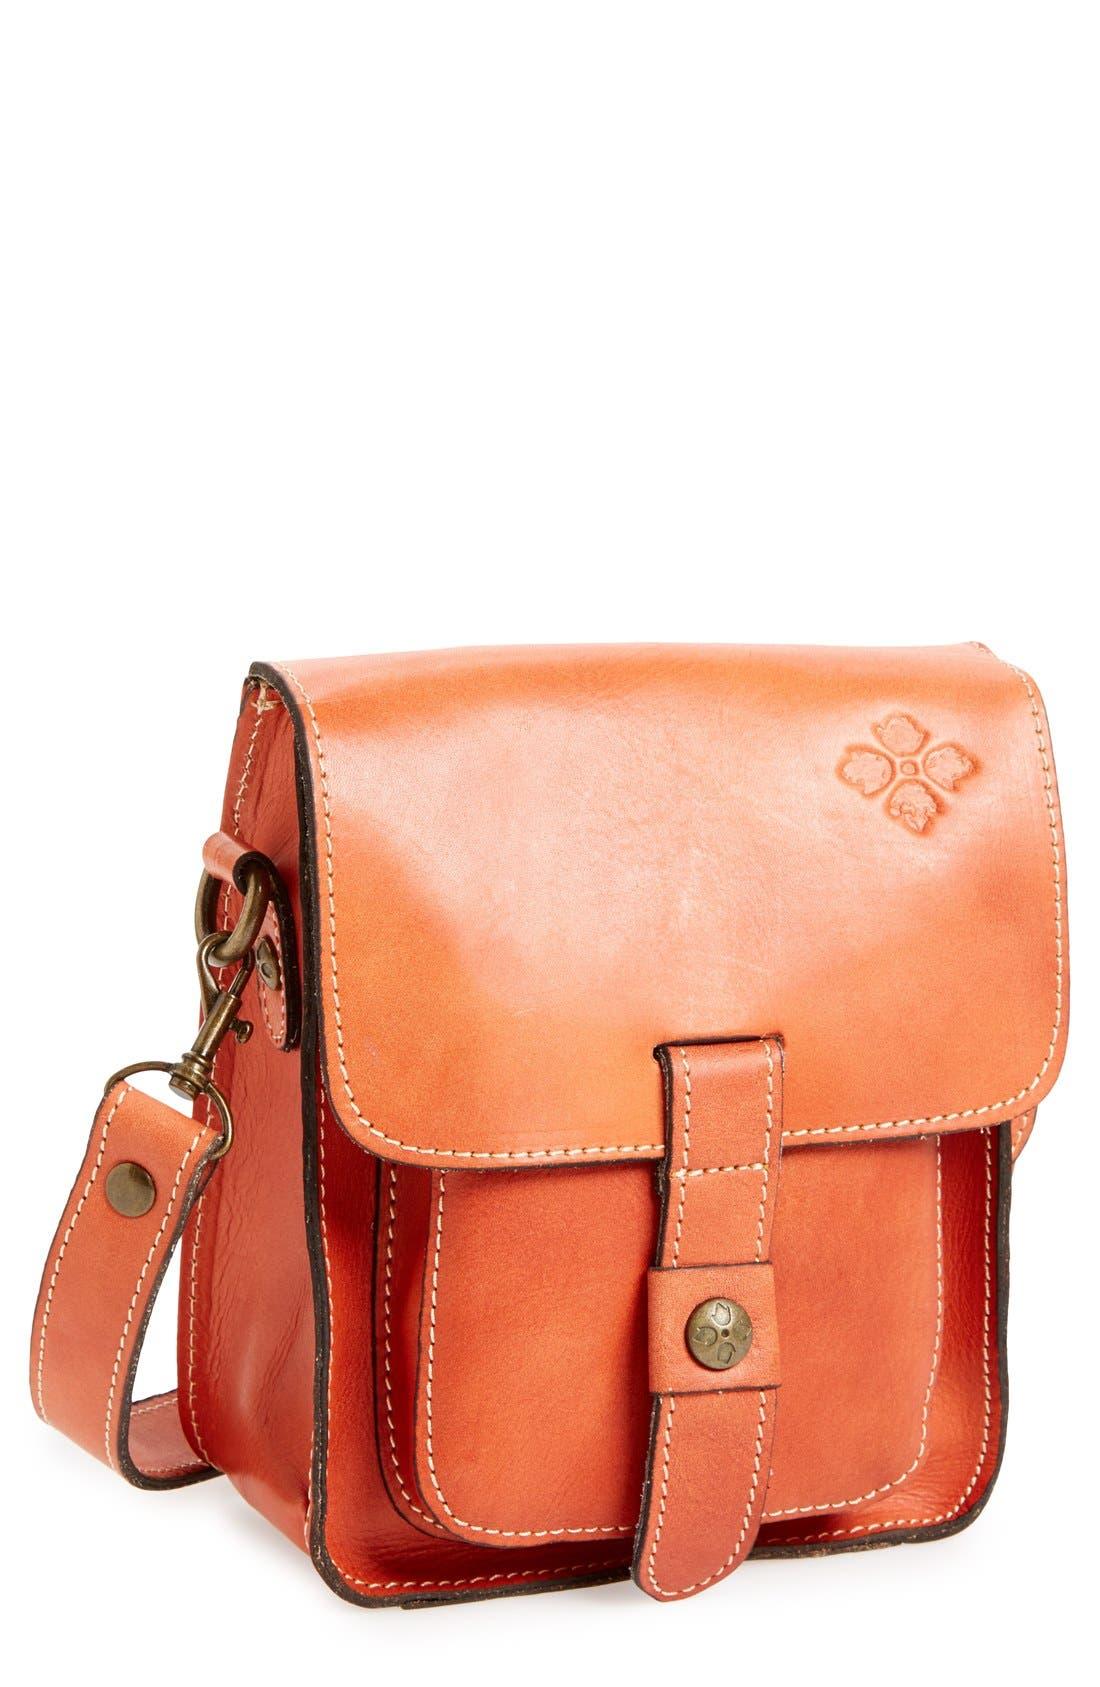 Alternate Image 1 Selected - Patricia Nash 'Lari' Leather Crossbody Bag